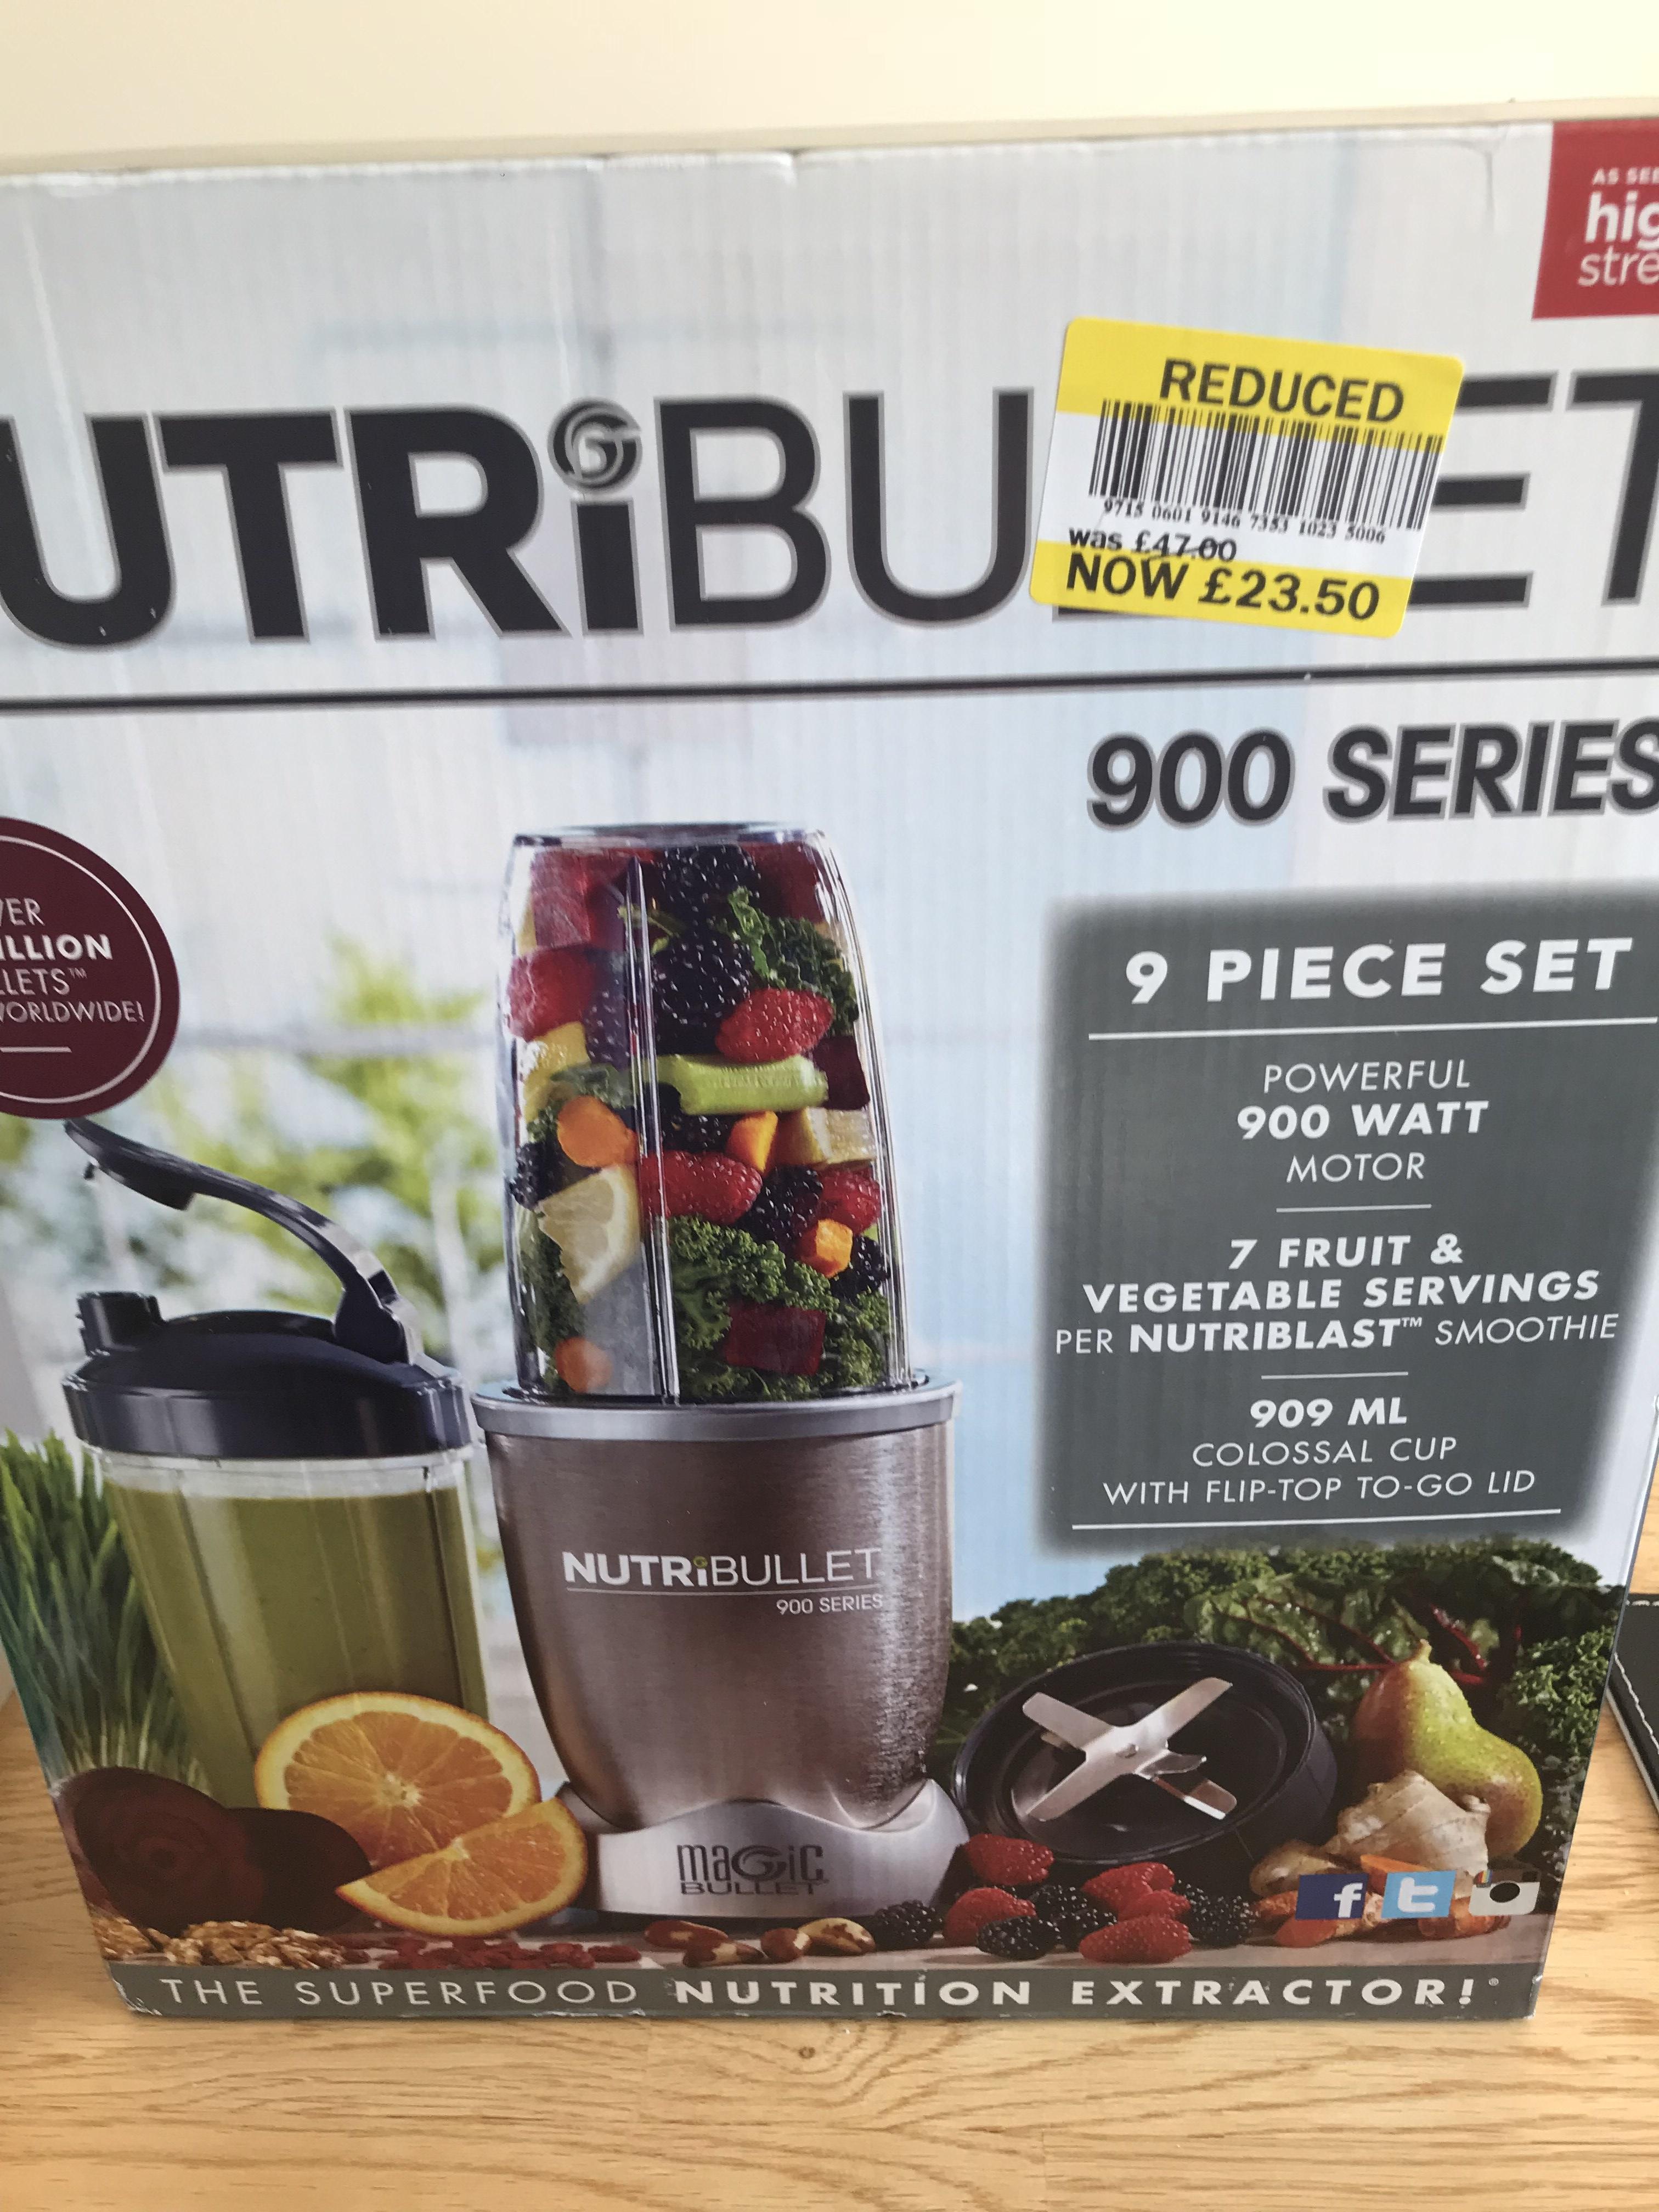 Nutribullet 900 Series £23.50 - Tesco Crumlin